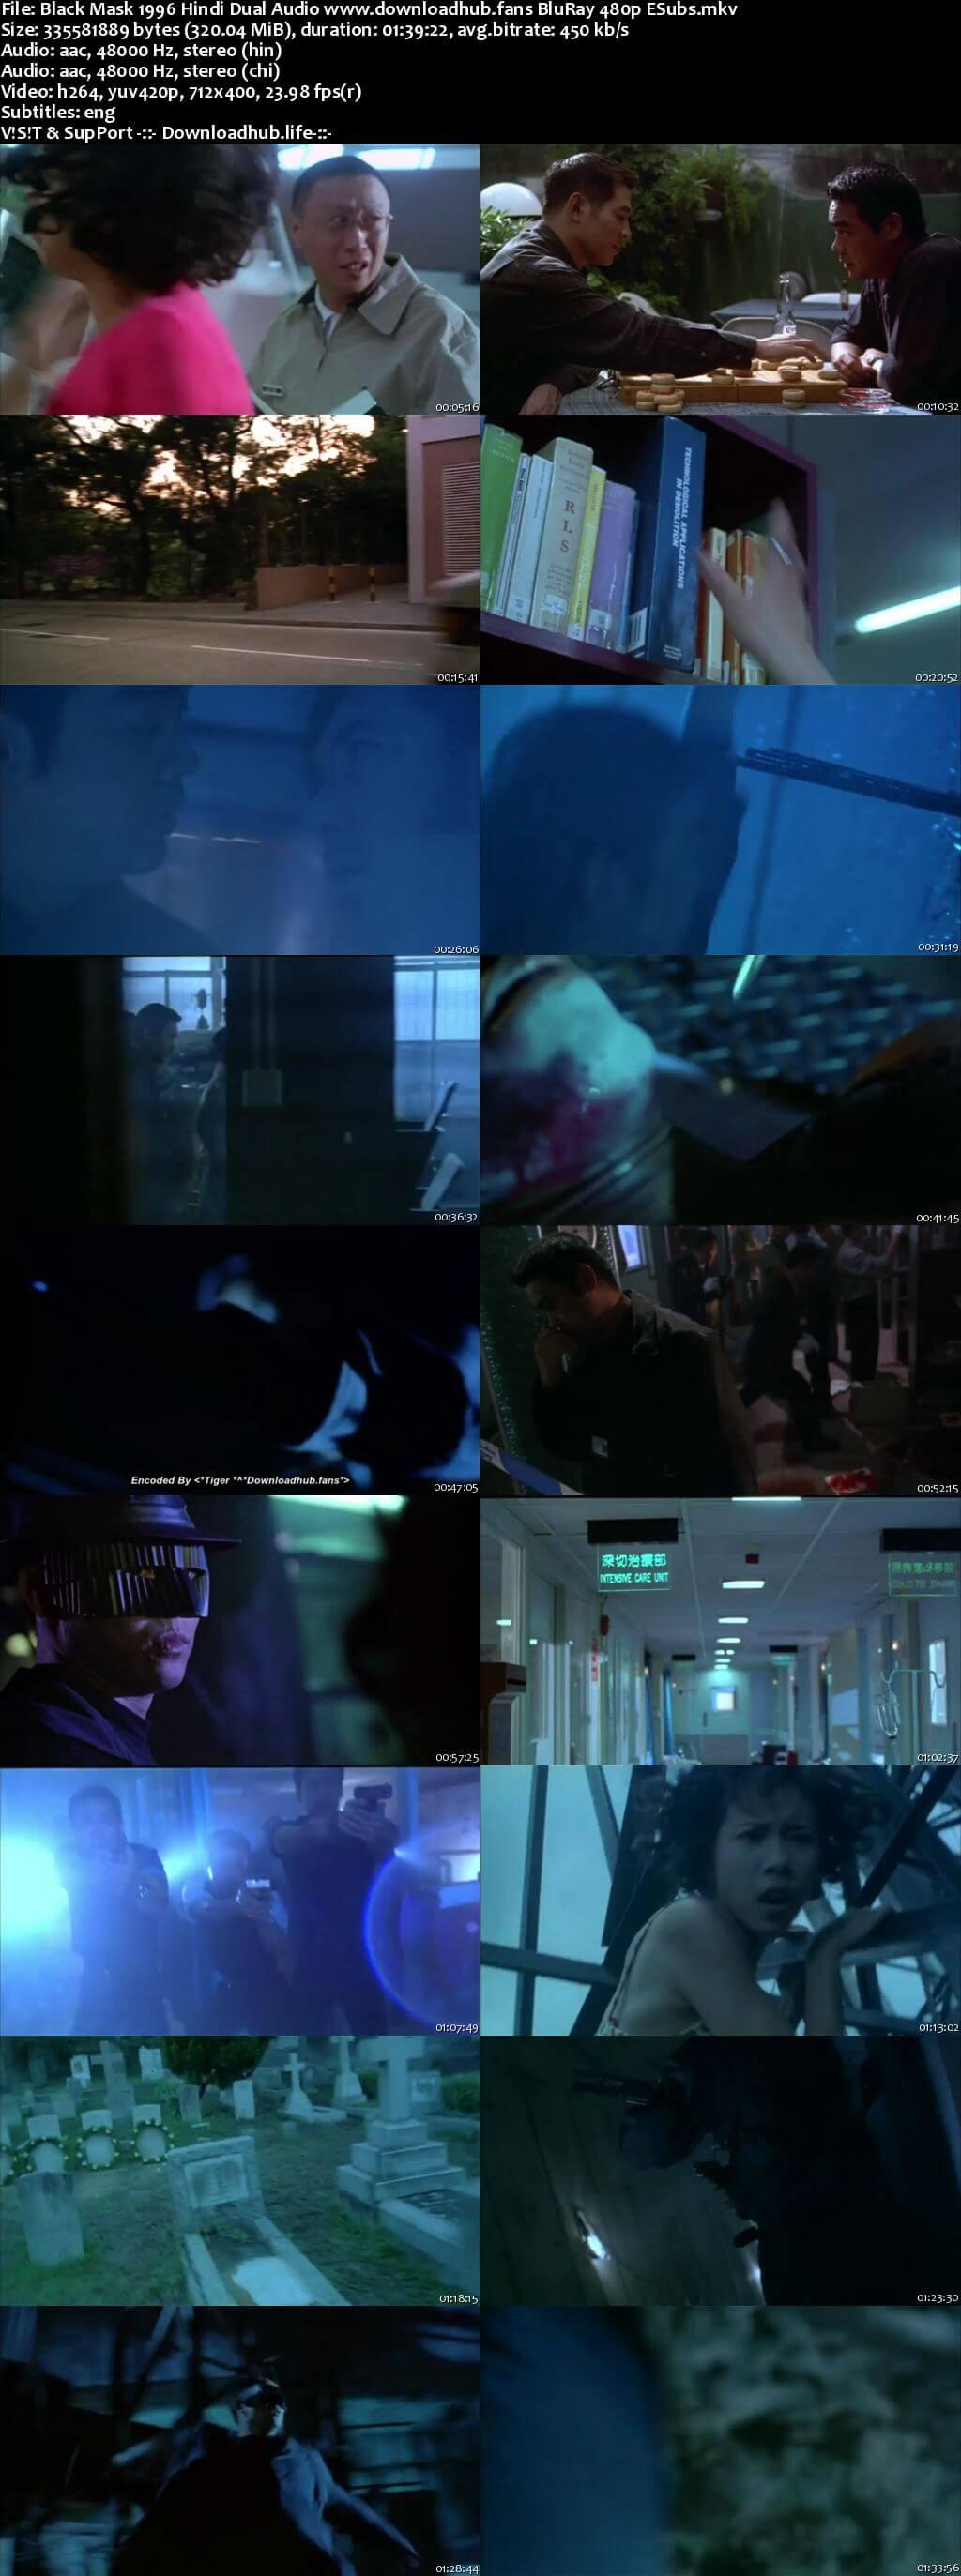 Black Mask 1996 Hindi Dual Audio 300MB BluRay 480p ESubs